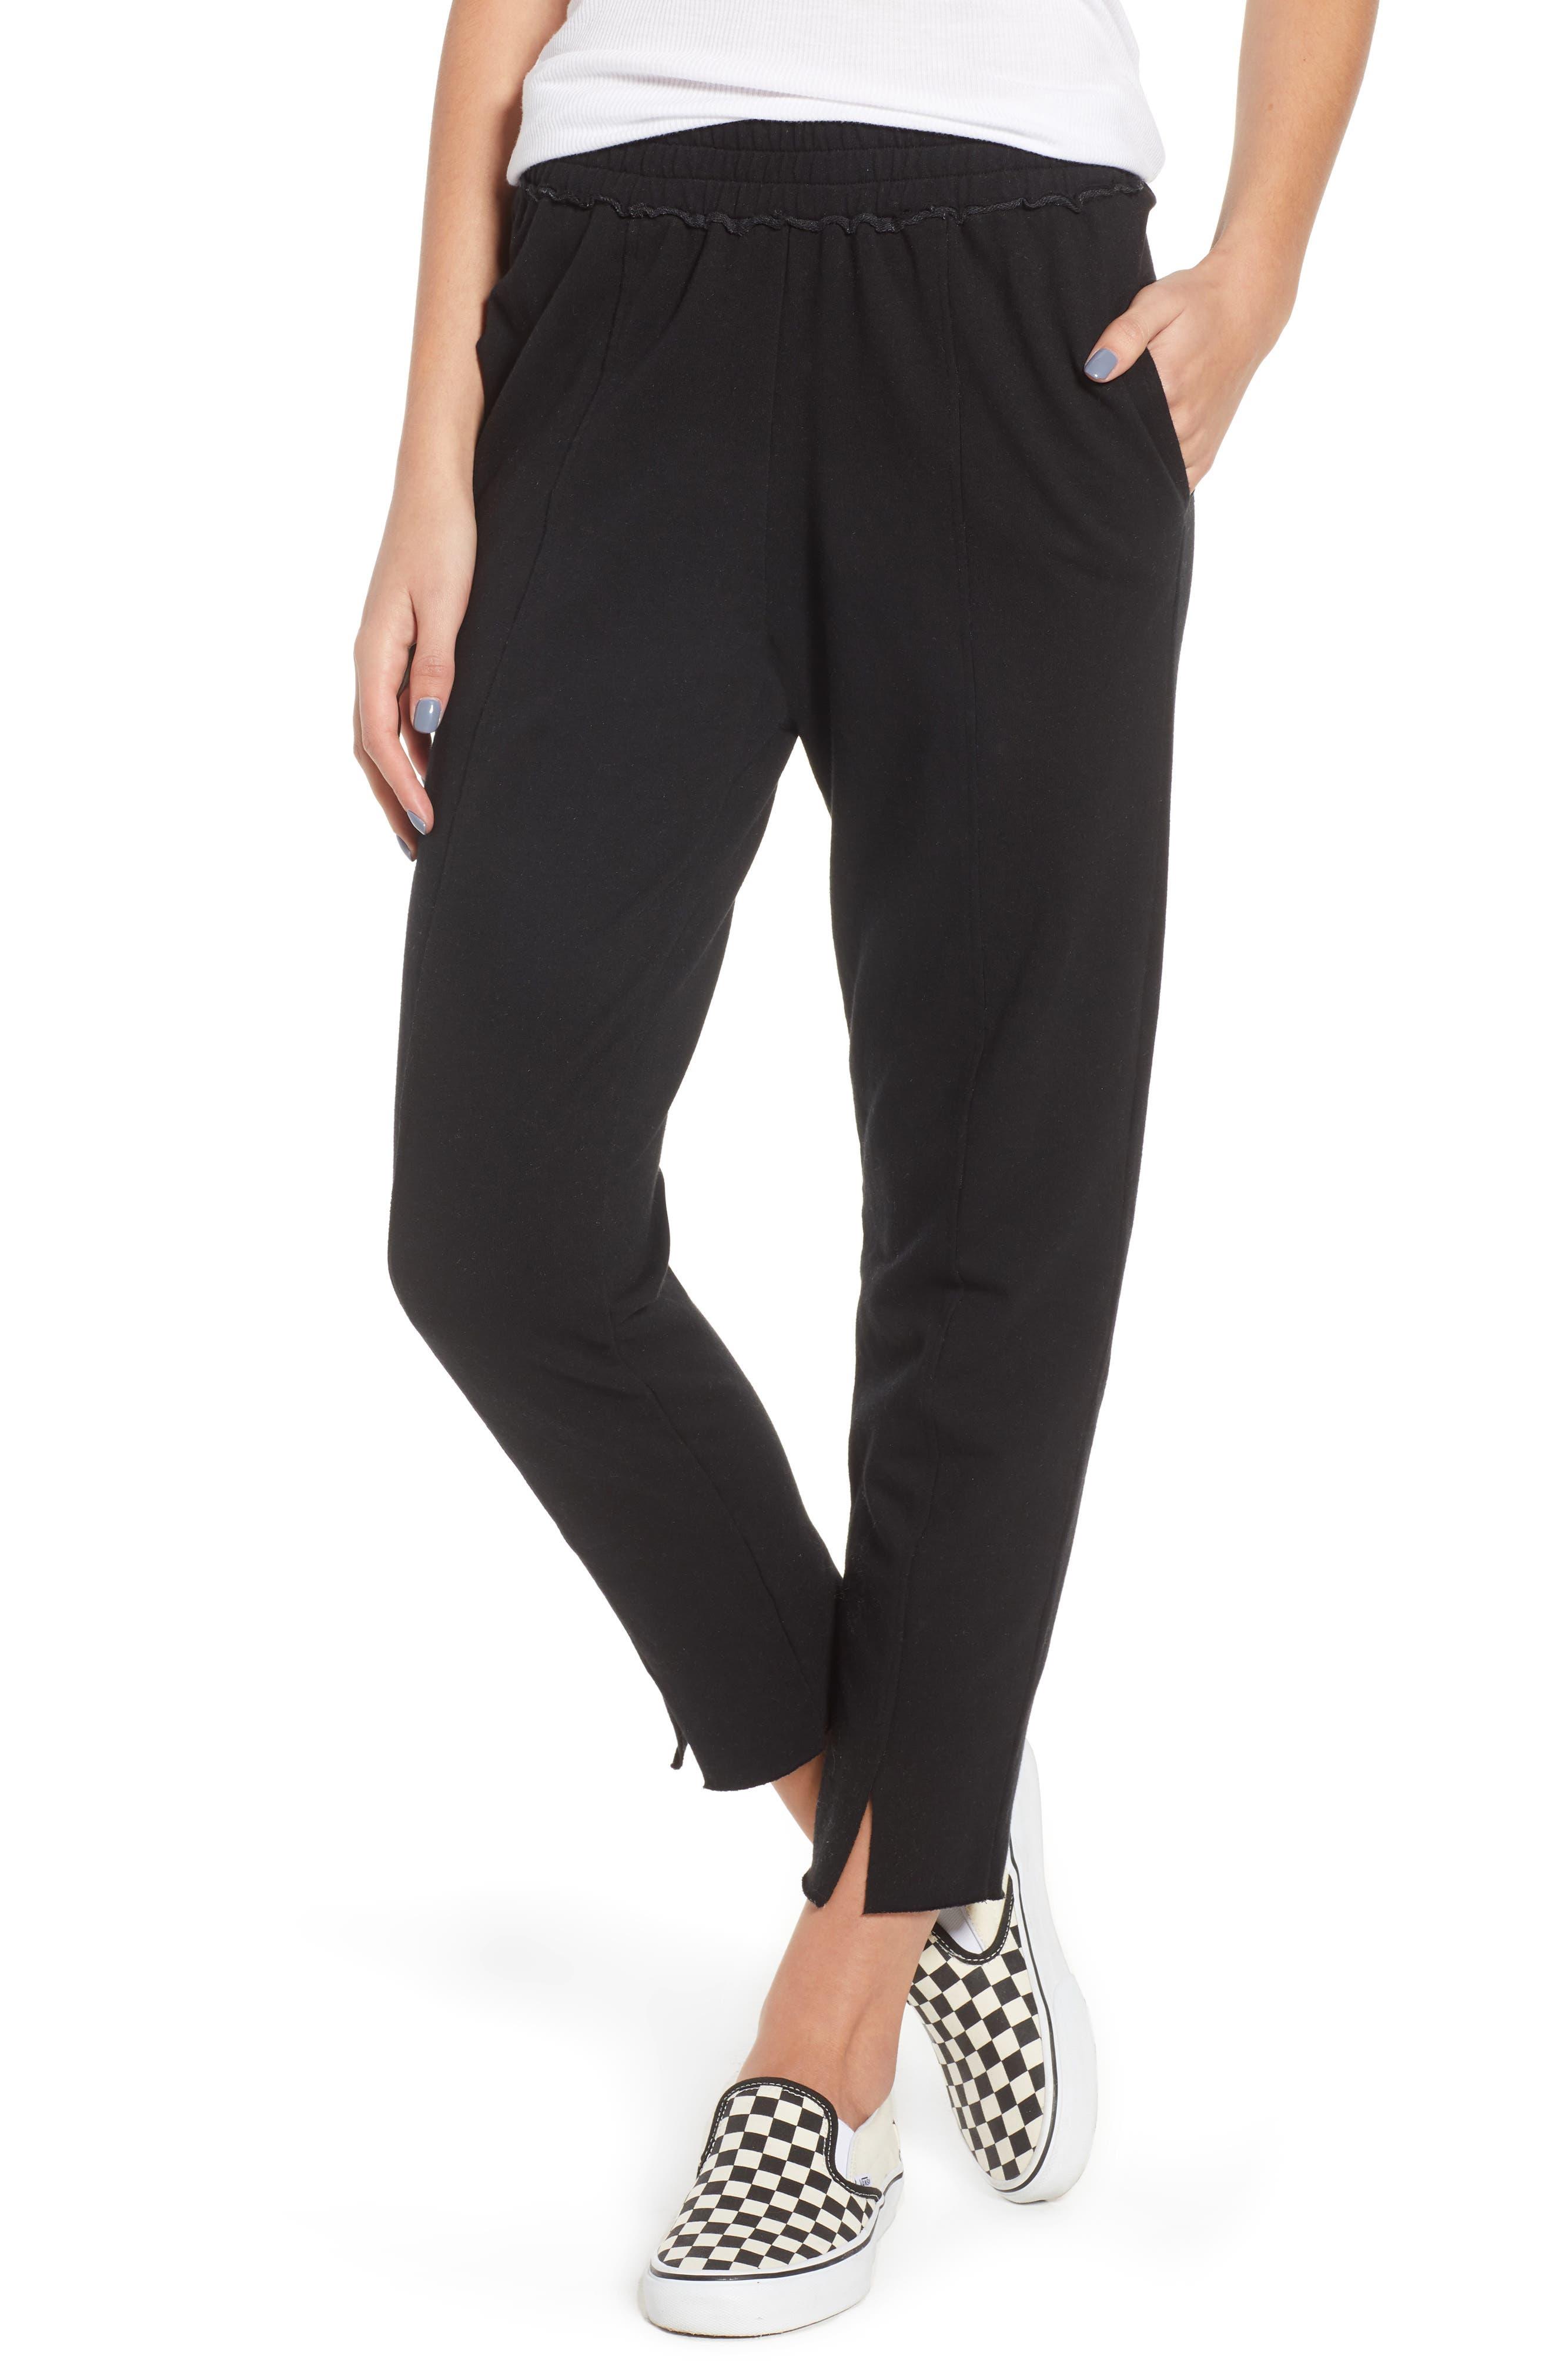 Lowsen Split Hem Sweatpants,                             Main thumbnail 1, color,                             Black